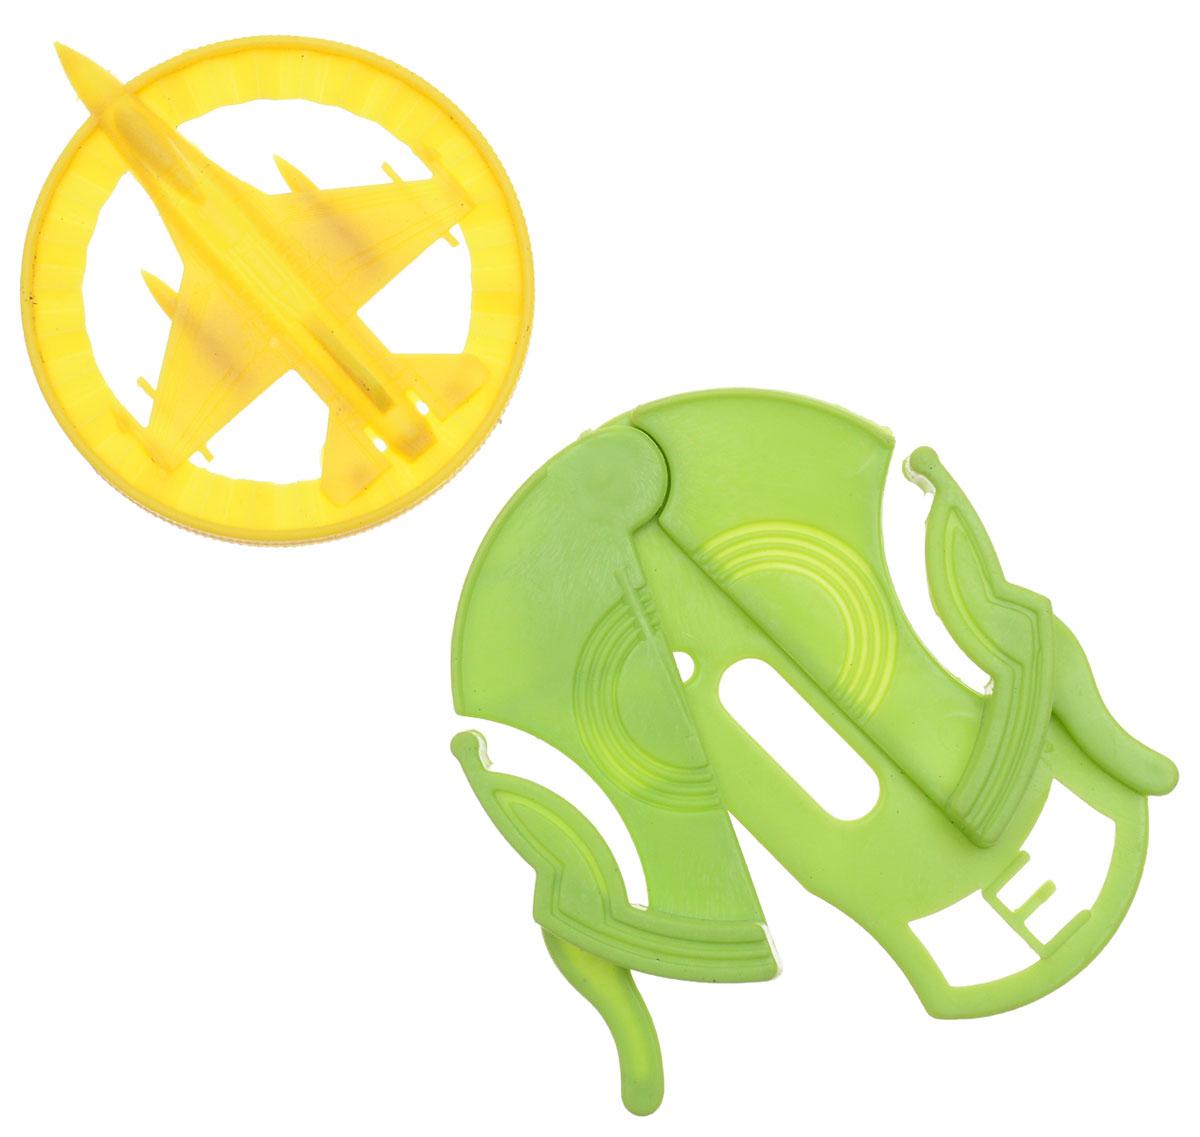 Sima-landСтрелялка цвет салатовый желтый Самолет 394294 Sima-land